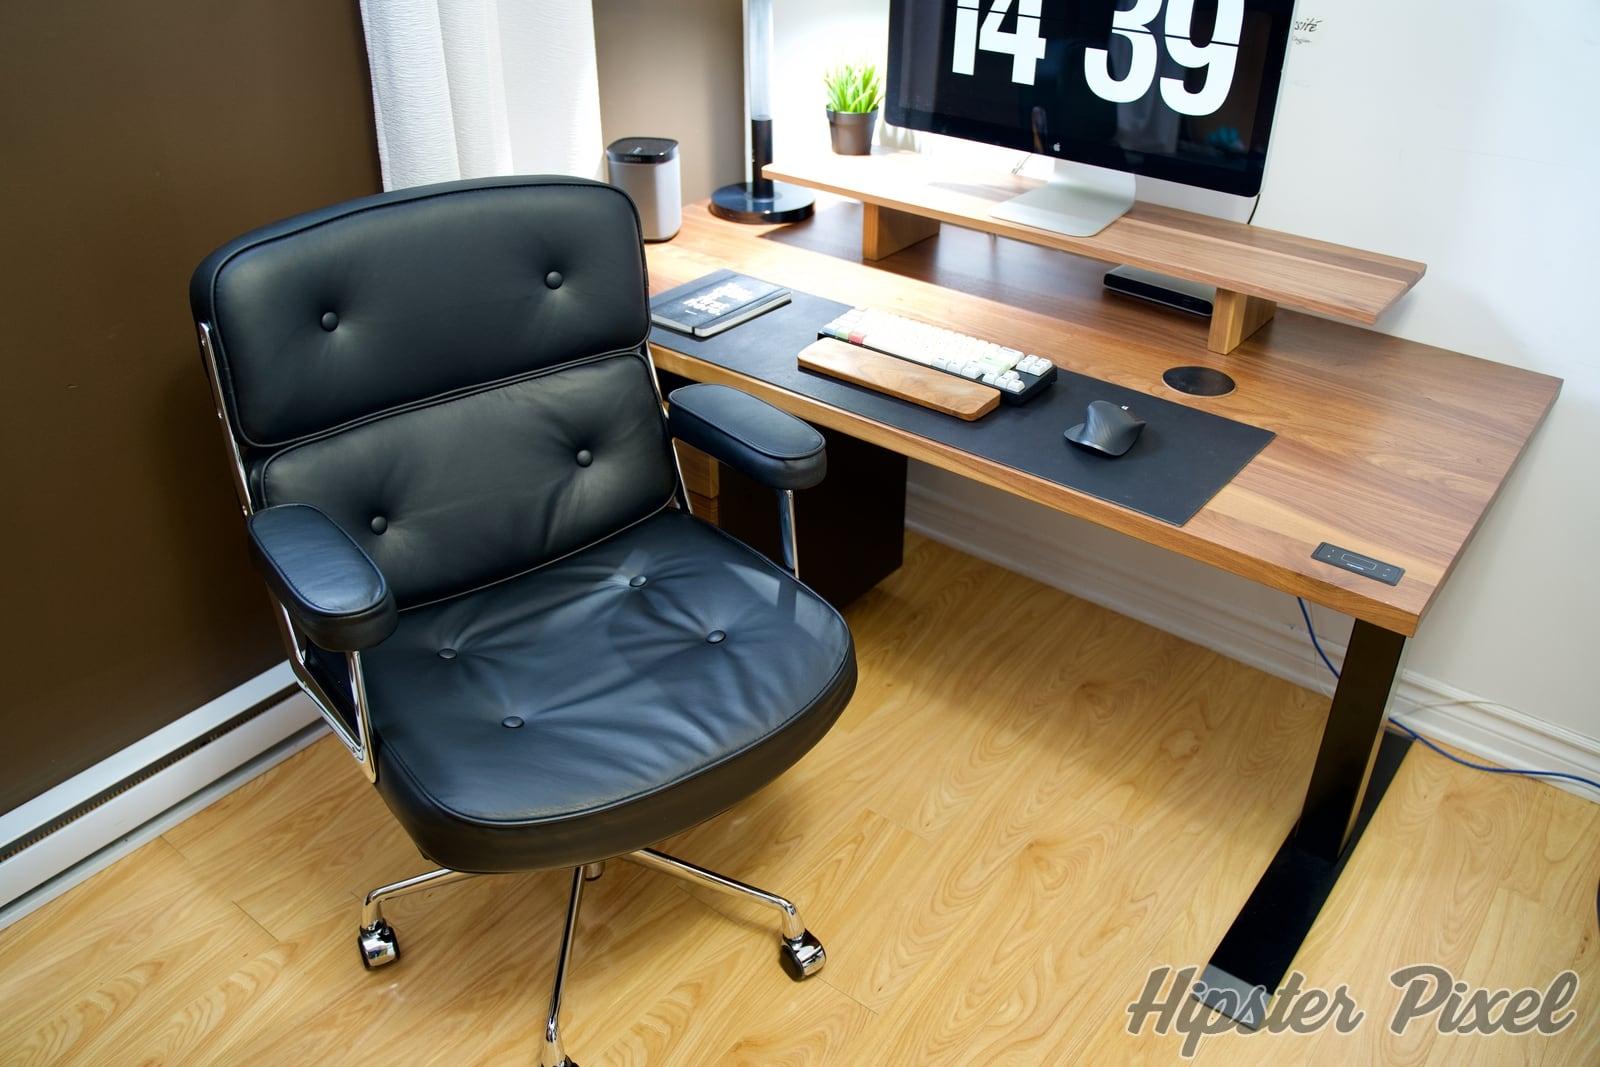 Eames Executive Chair, a Mid-Century Modern Computer Chair [Review]